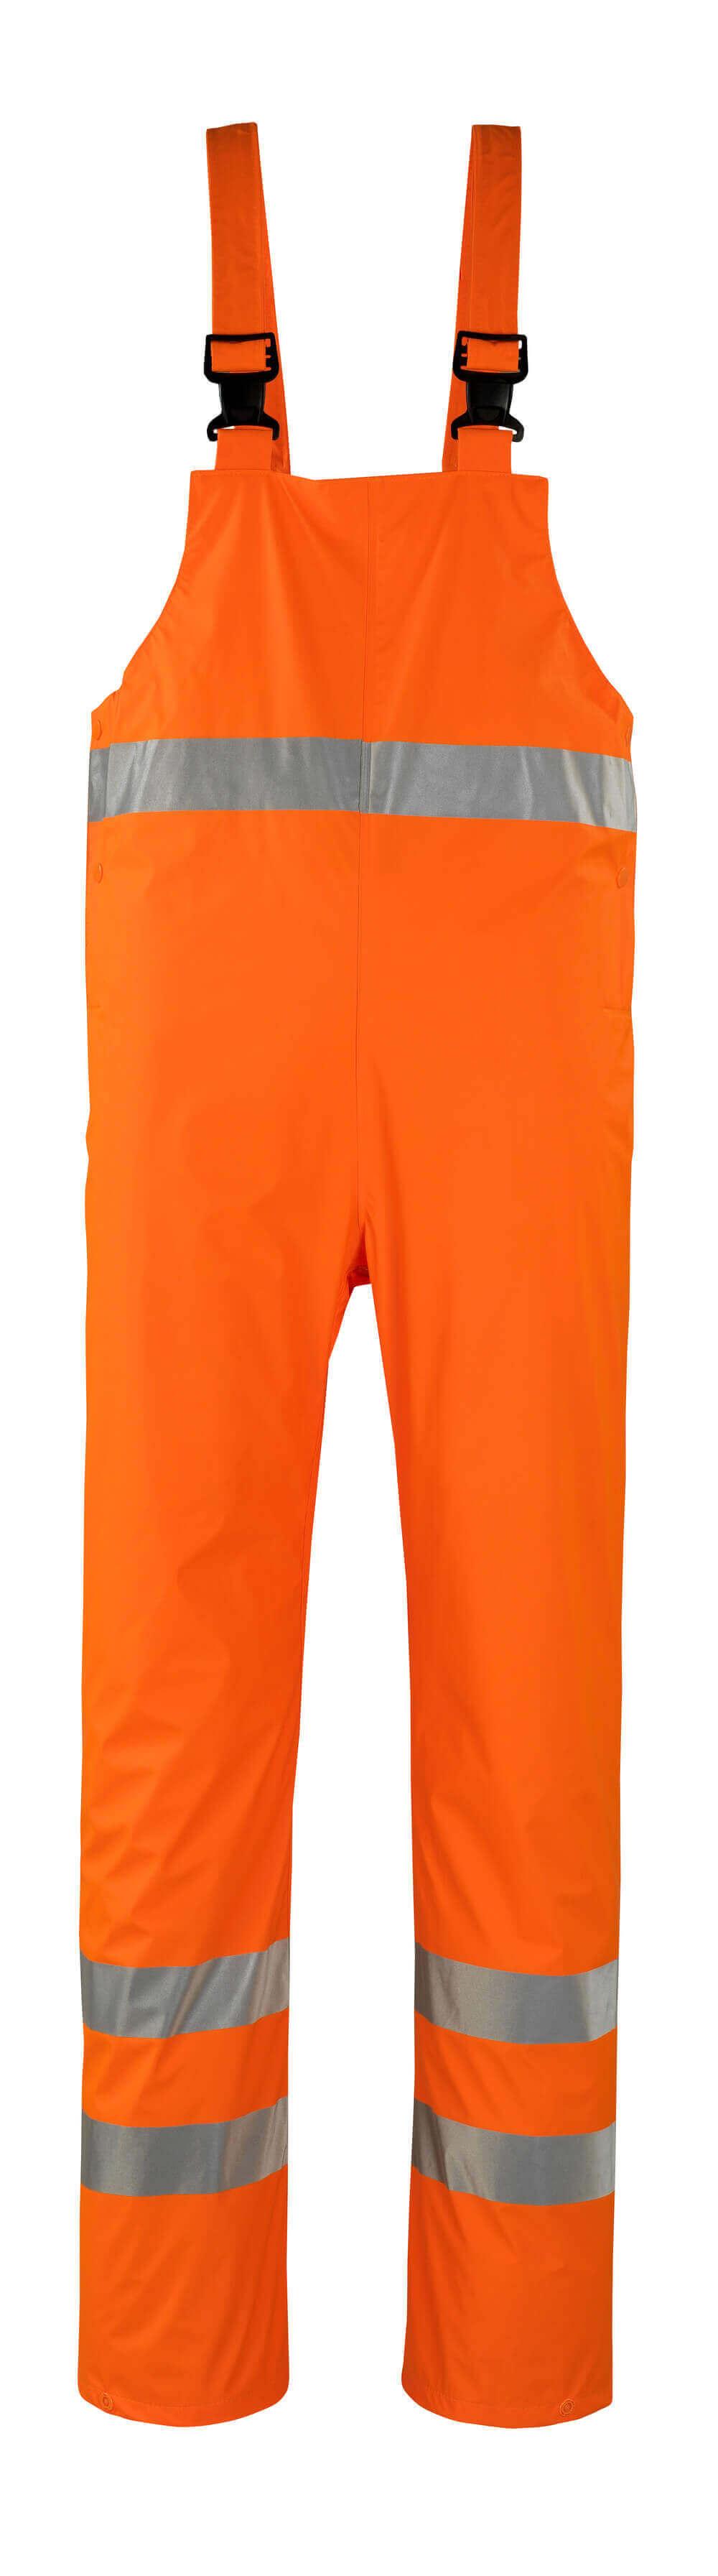 50103-814-14 Sadeavosuoja - hi-vis oranssi